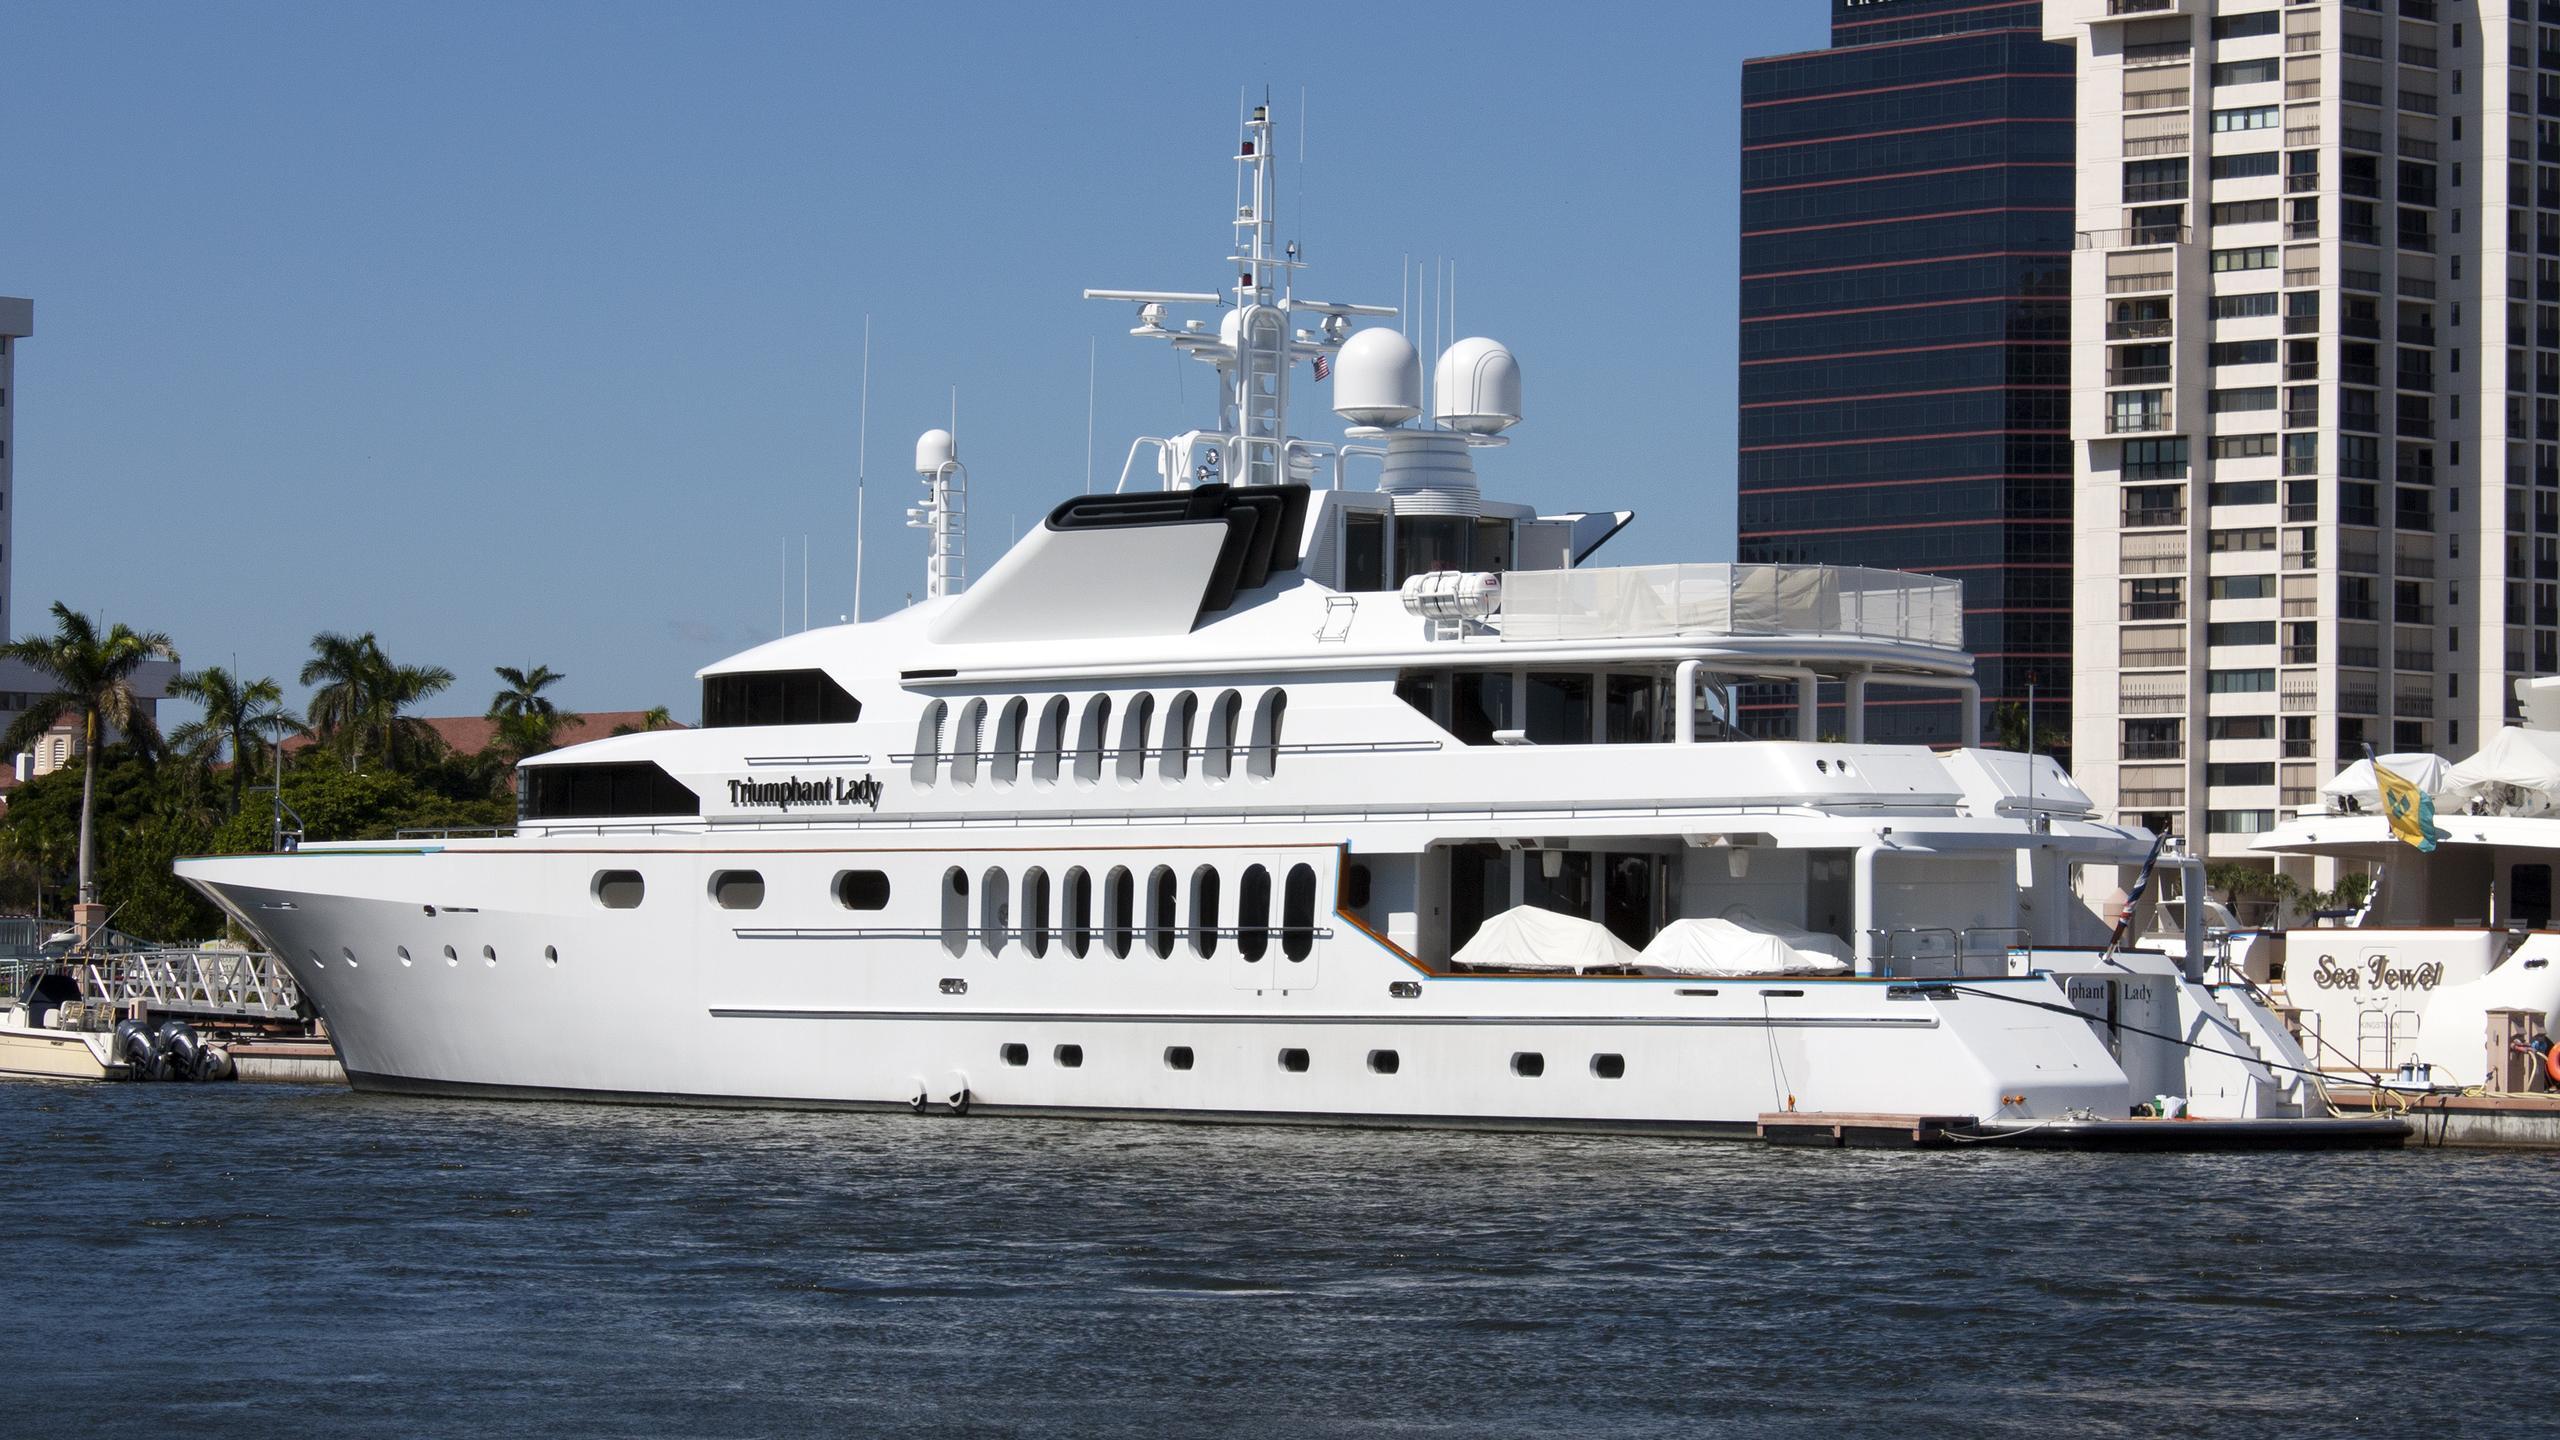 triumphant-lady-yacht-exterior